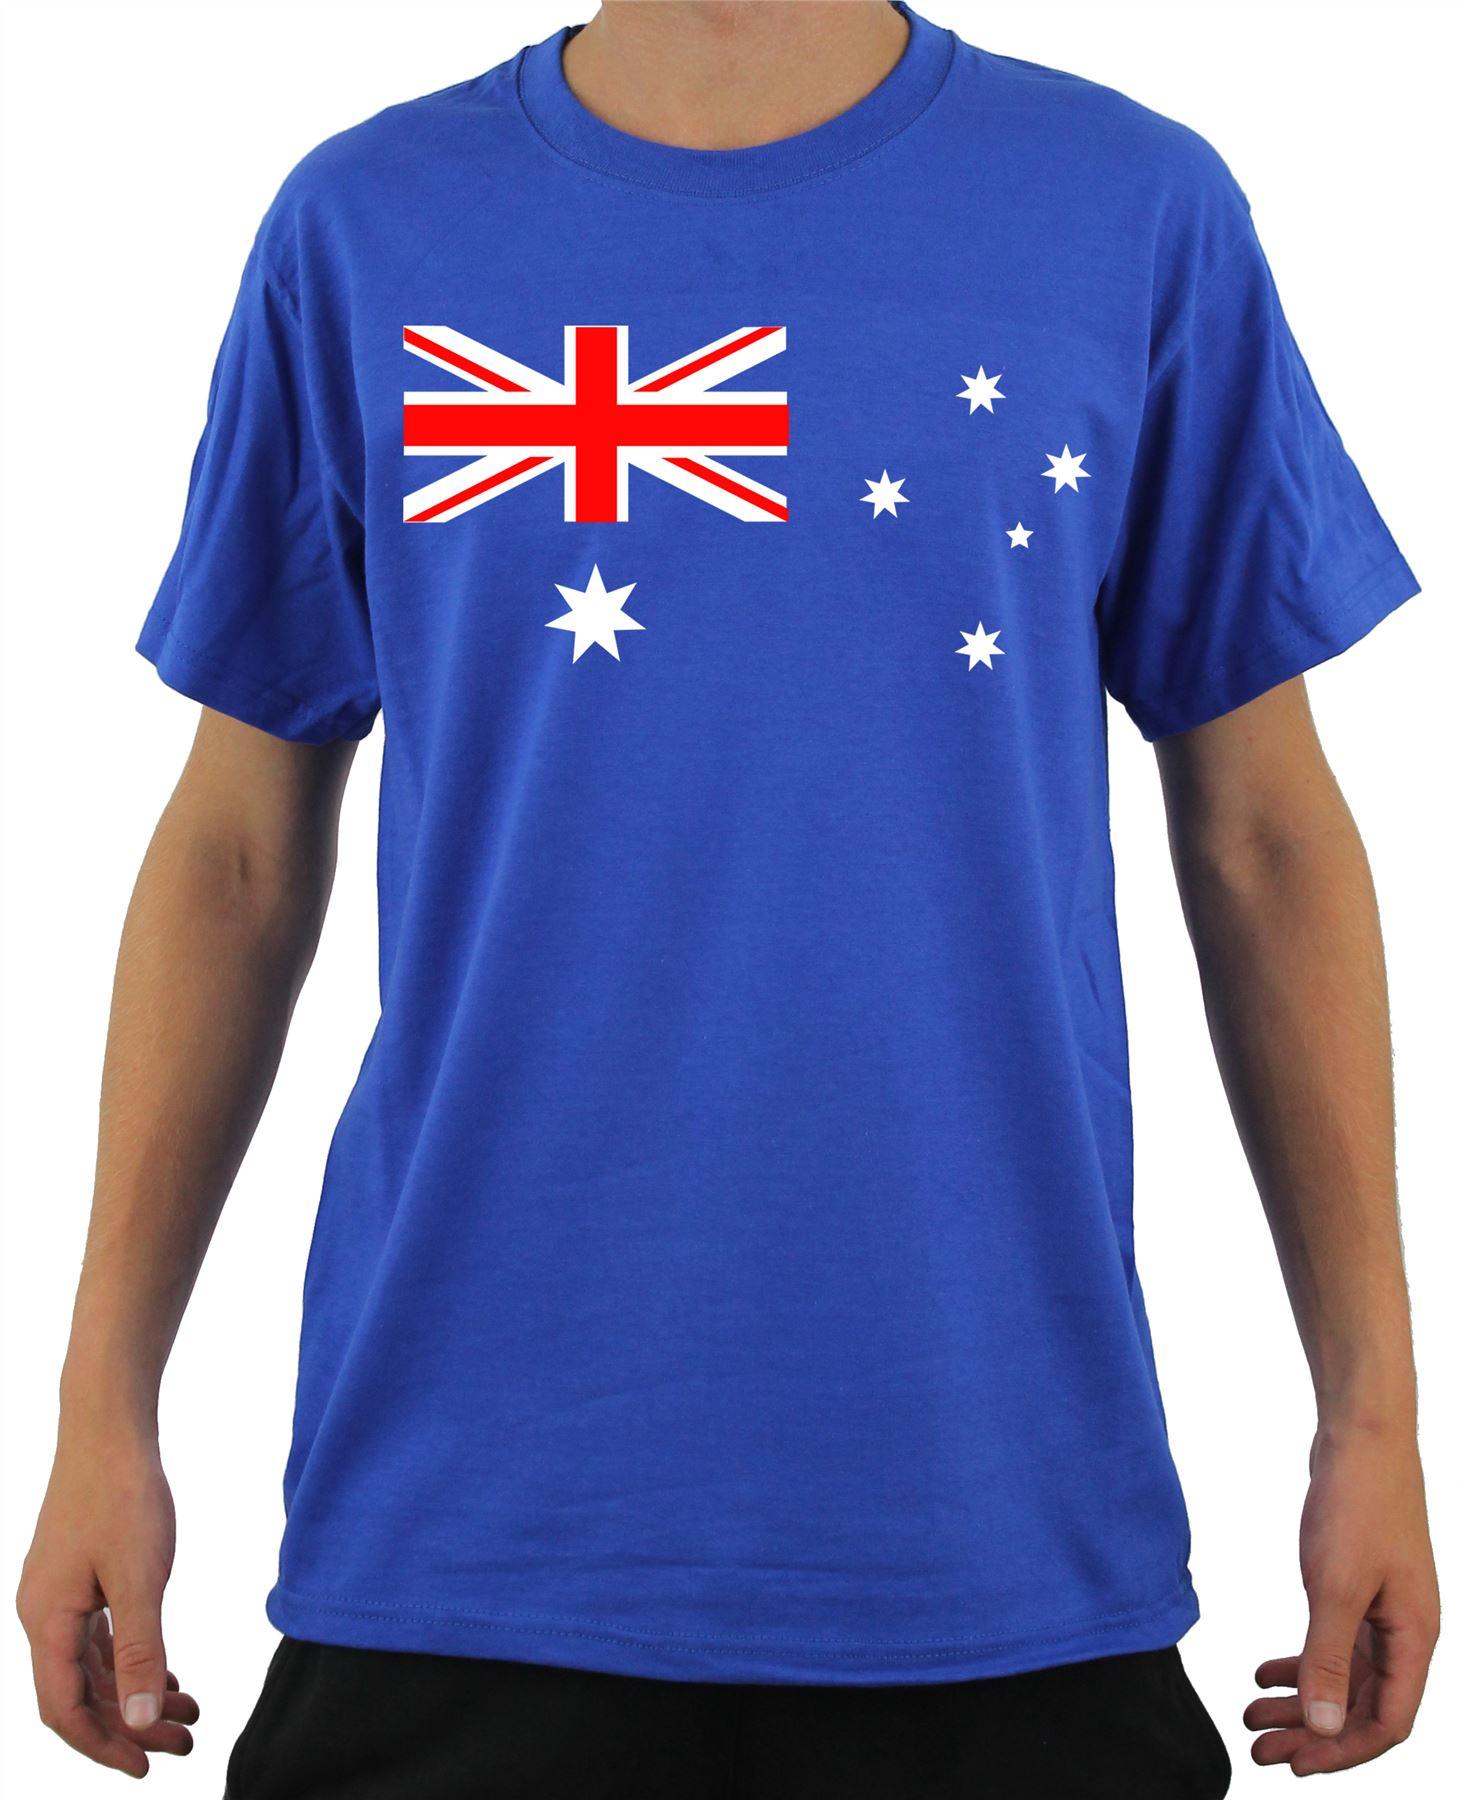 australia should change their flag